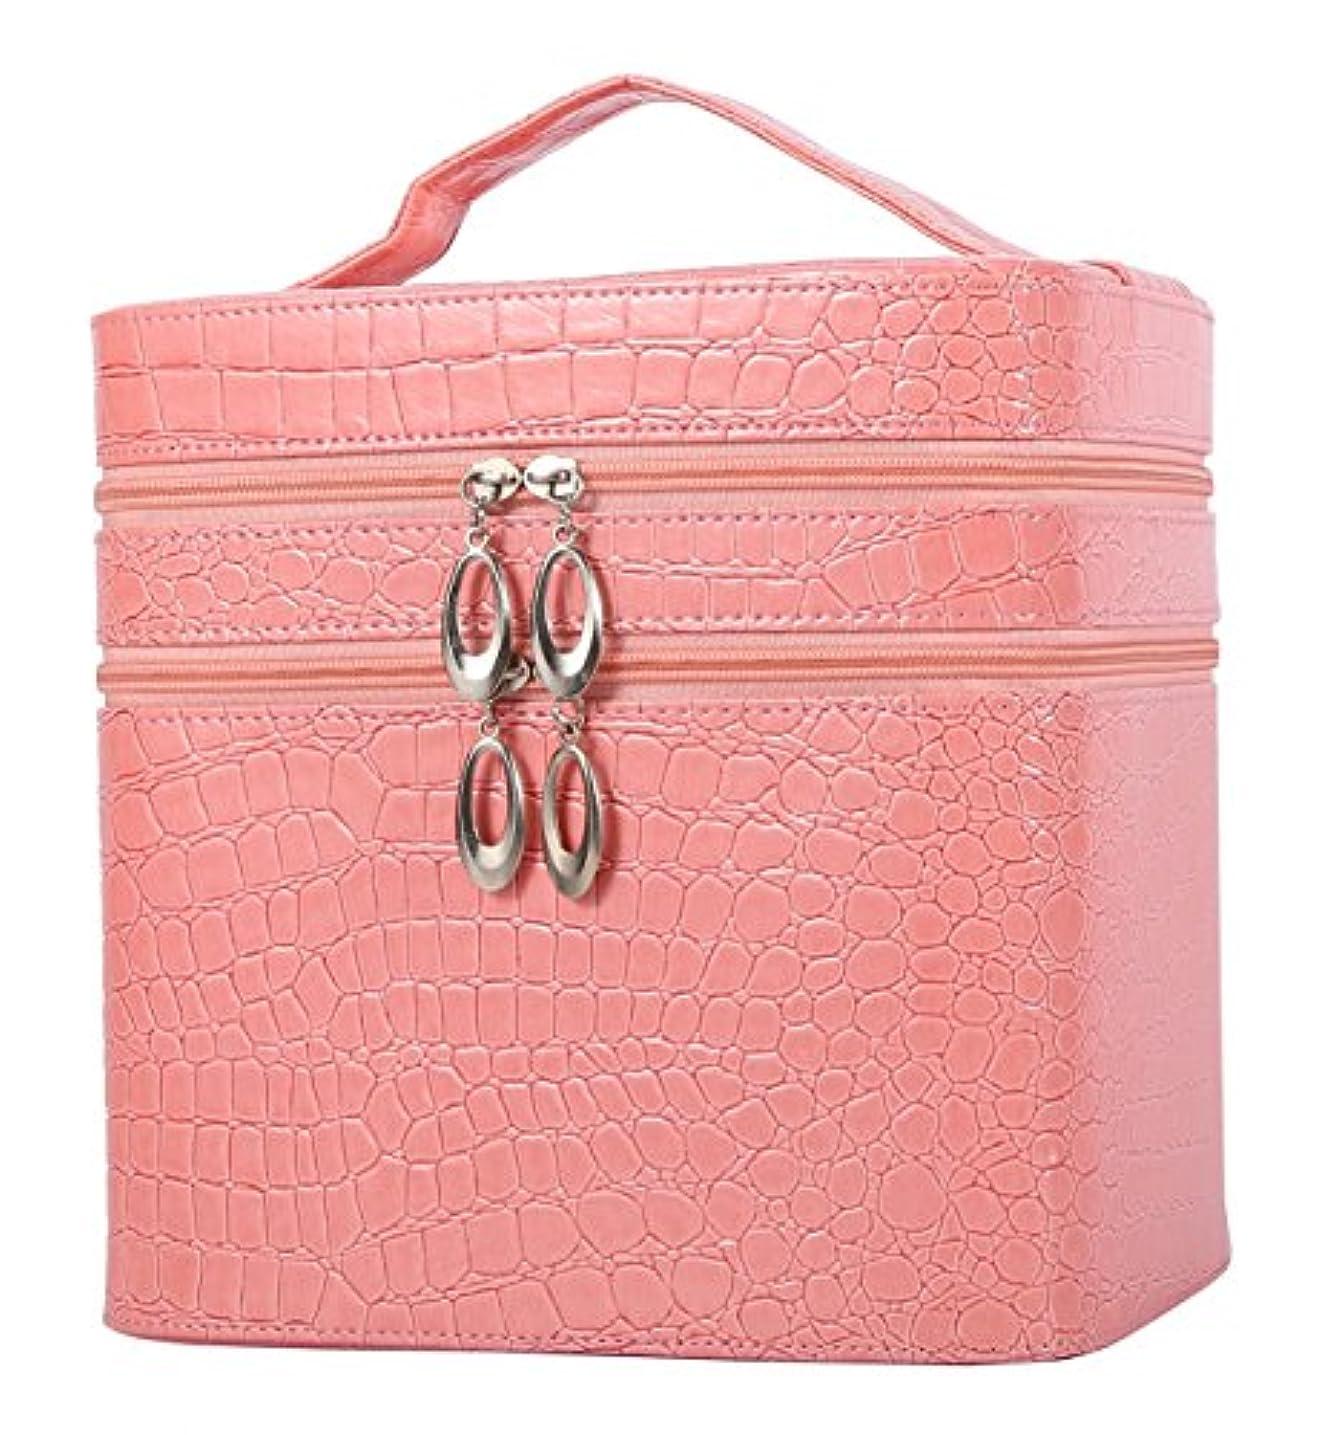 HOYOFO メイクボックス コスメ収納 大容量 おしゃれ 化粧入れ 収納ケース 鏡付き 二段式 ギフト ピンク